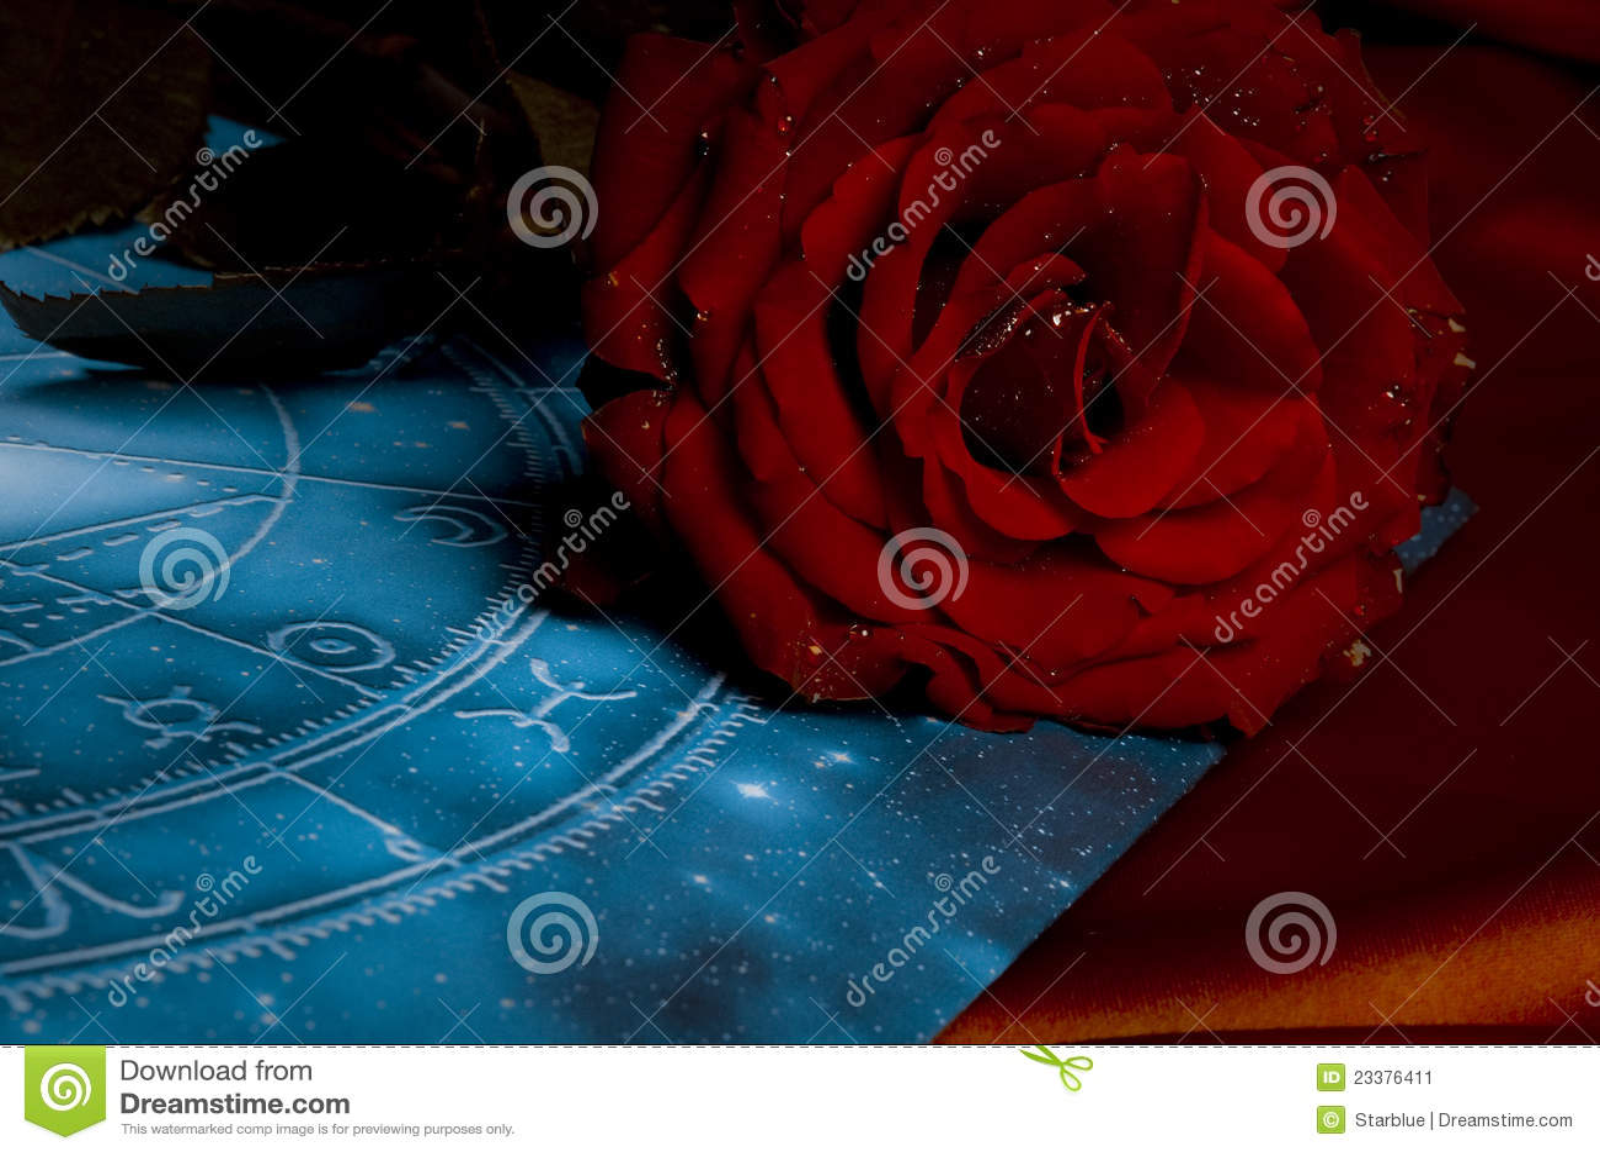 Astrologie et amour